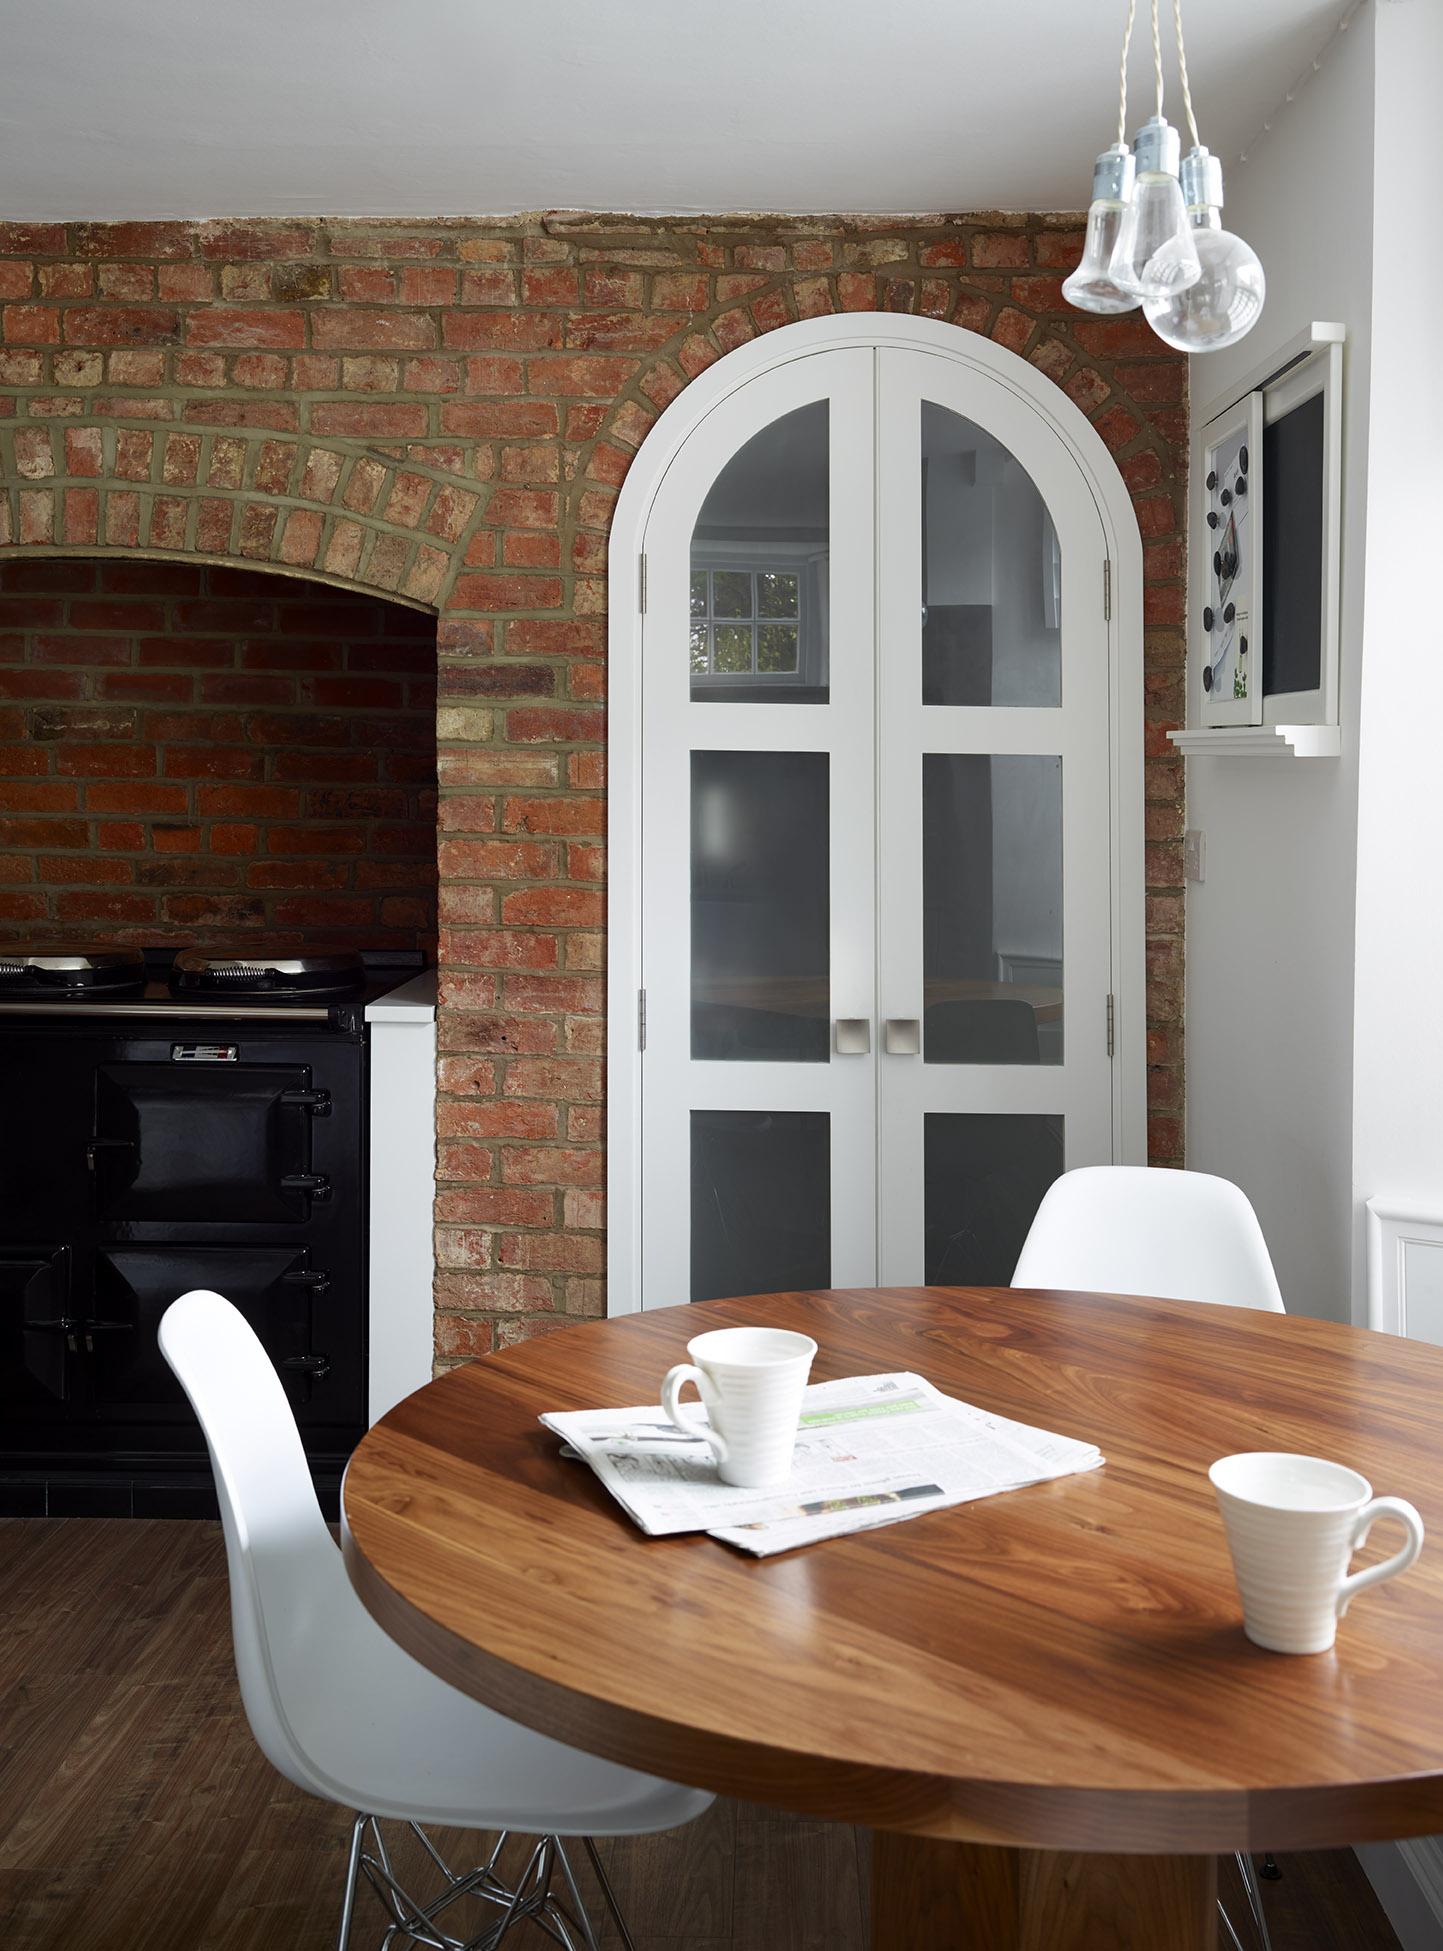 Stoke Goldington - Modern circular walnut table in 18ᵗʰ century cottage